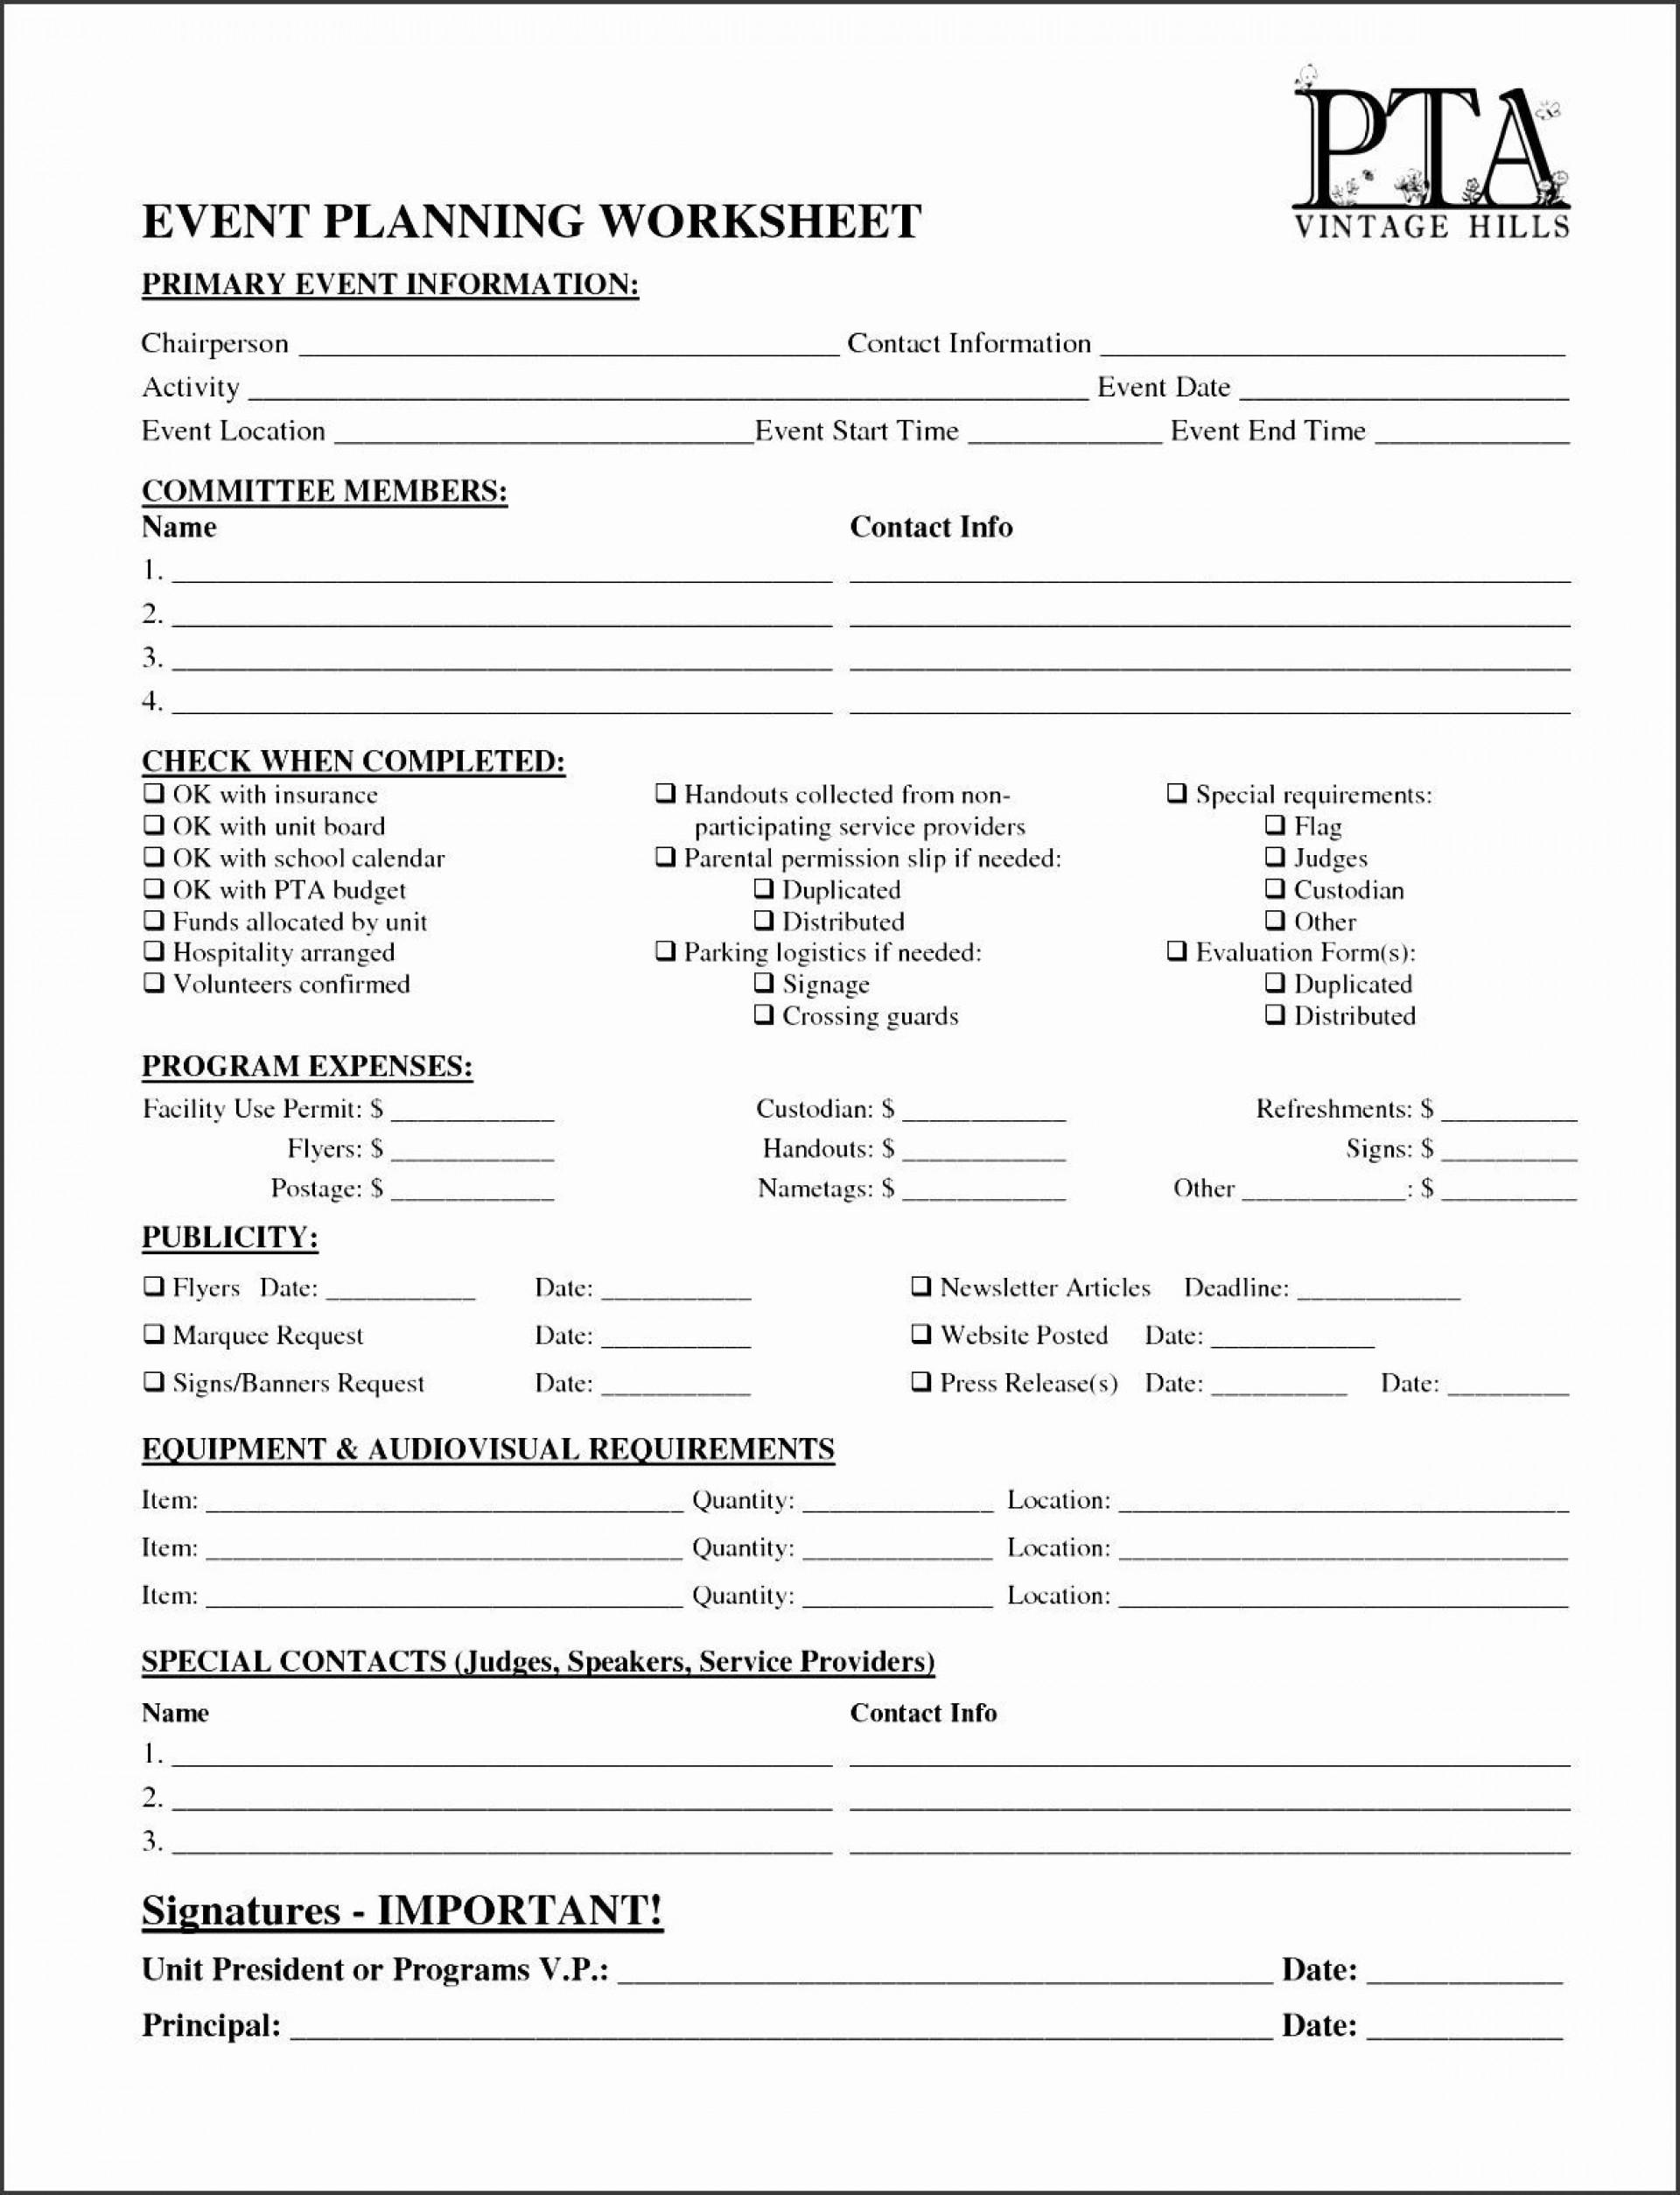 001 Simple Event Planning Worksheet Template Sample  Planner Checklist Budget1920